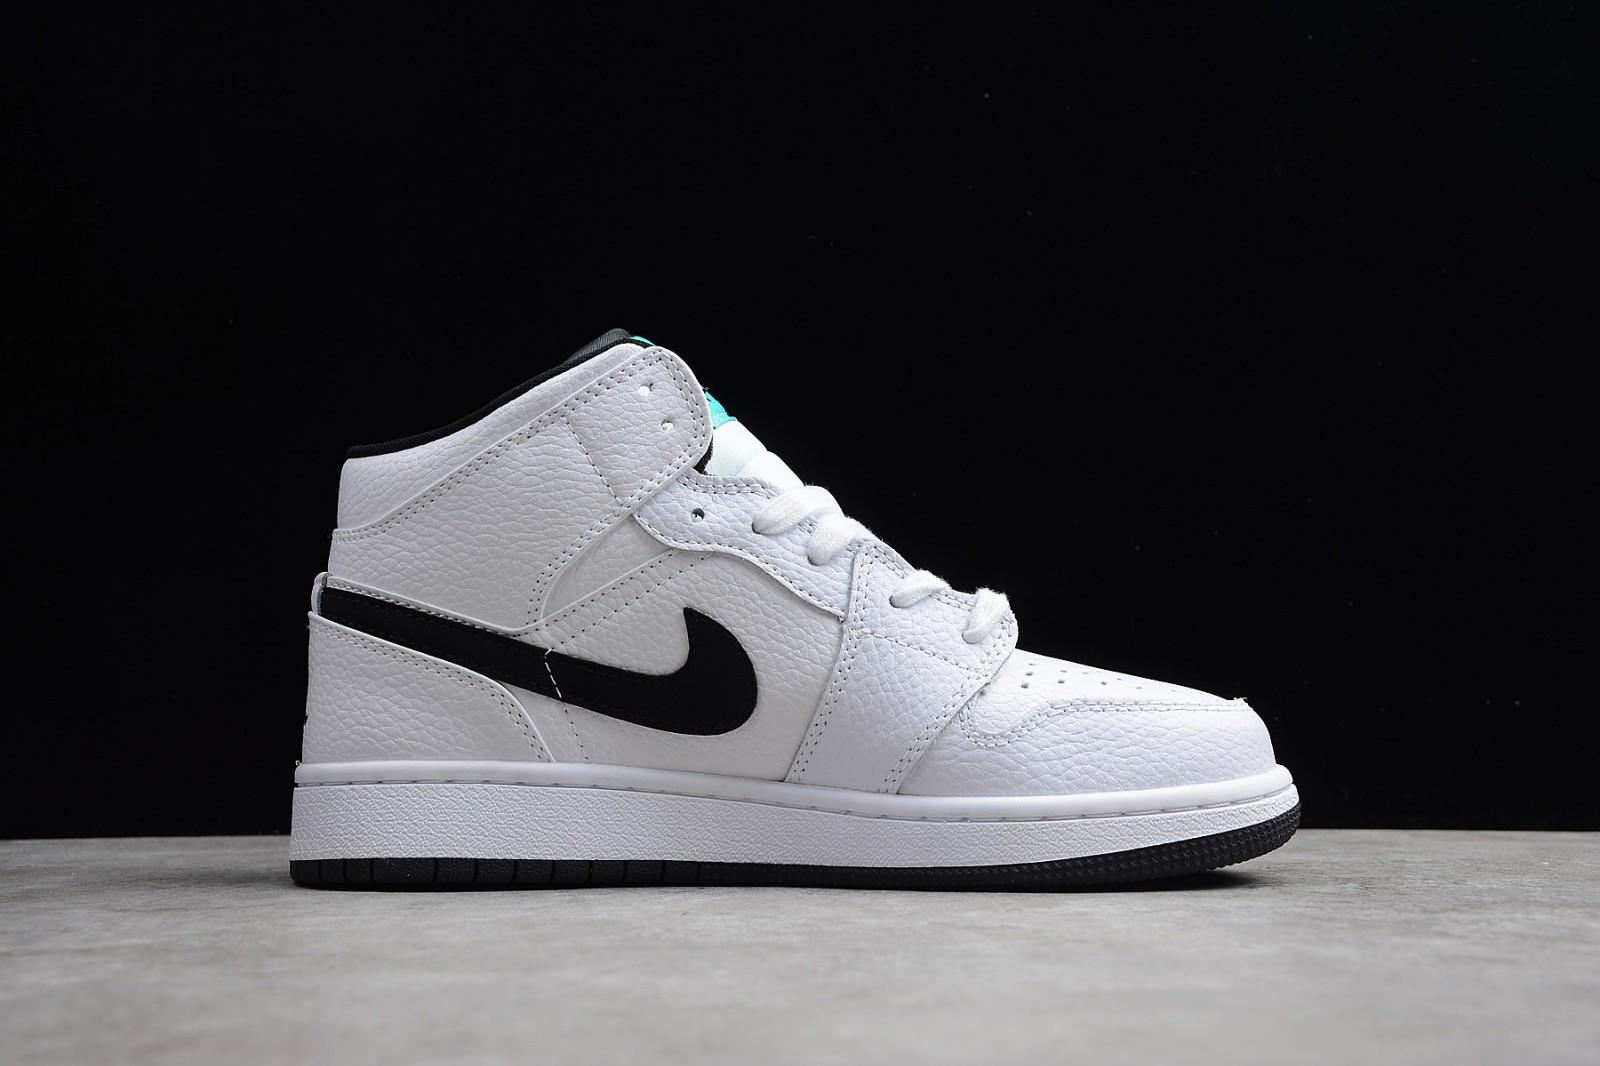 67fbebc5e186fa Nike Air Jordan 1 Mid GS Hyper Jade AJ1 Black White Green 554725-122 ...